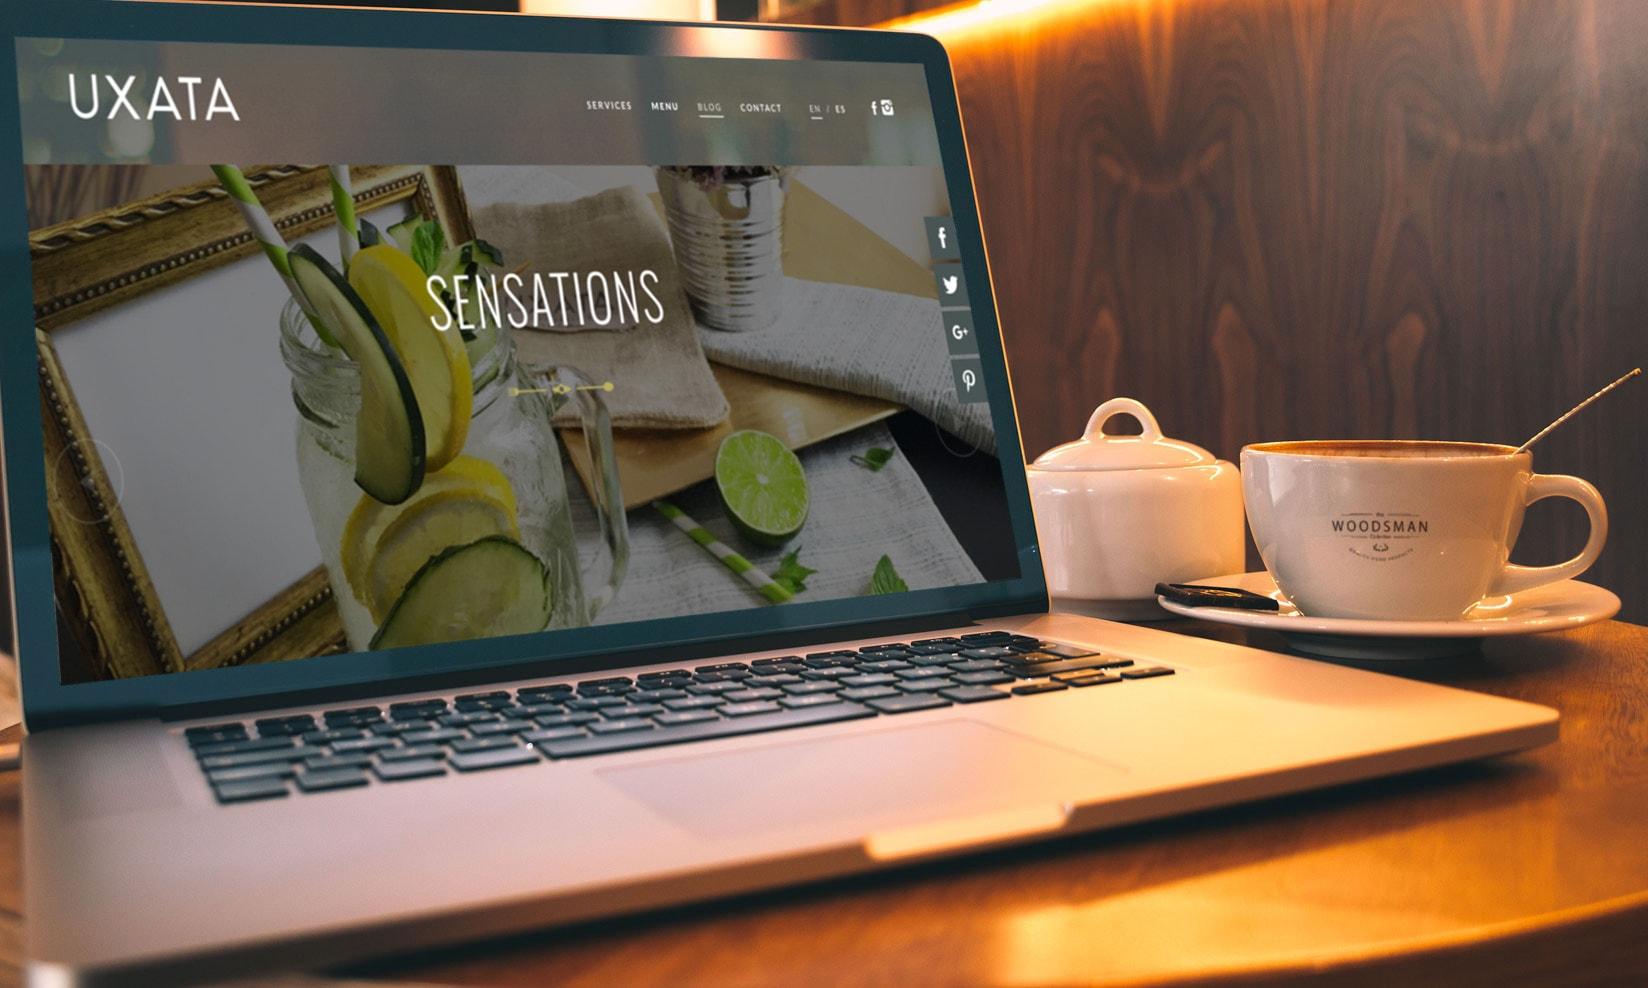 diseño web playa del carmen